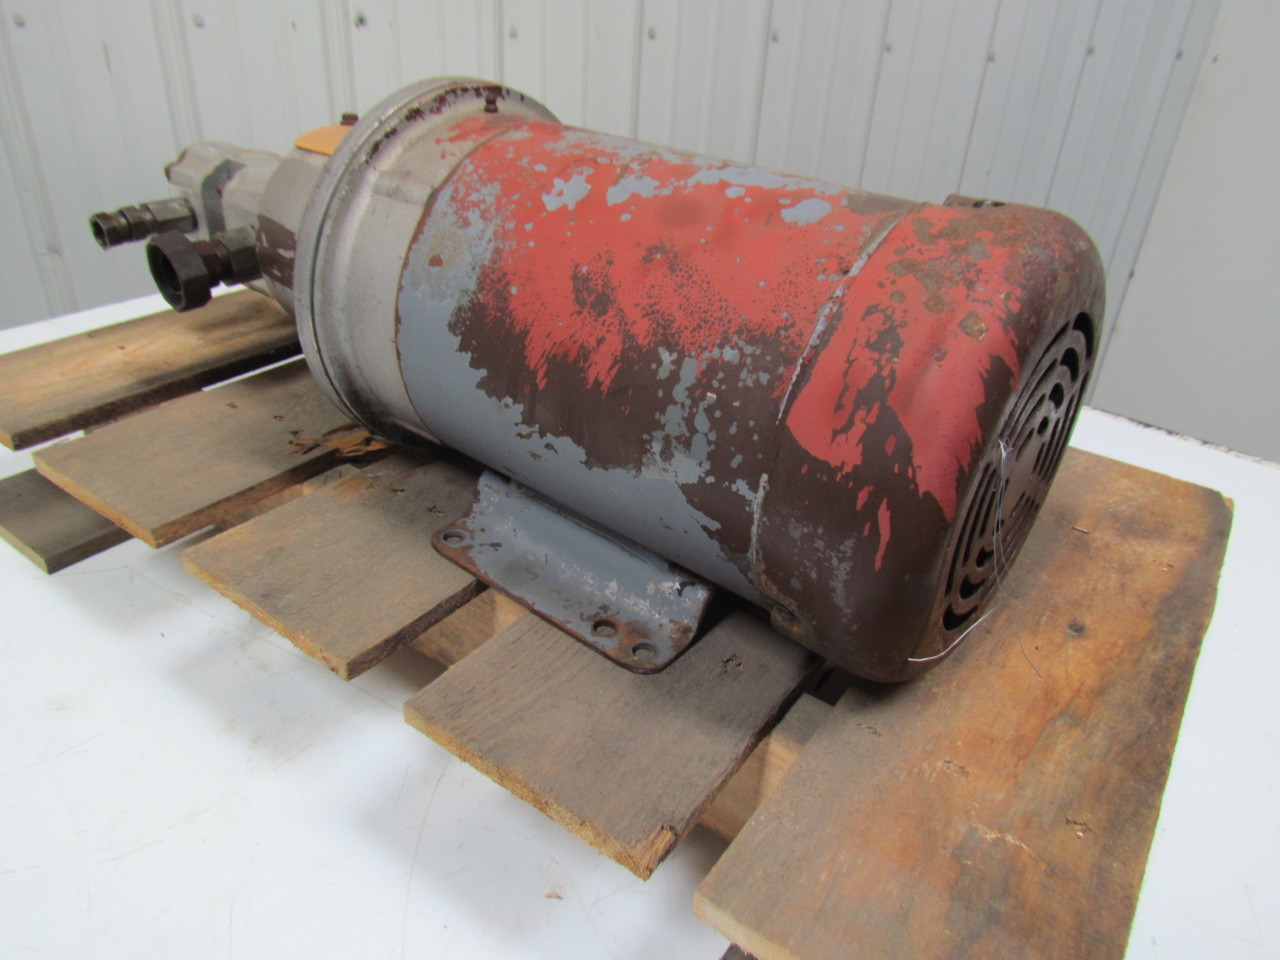 Baldor cm3615t electric motor 5hp 3ph 1750rpm 184tc frame for Electric motor hydraulic pump